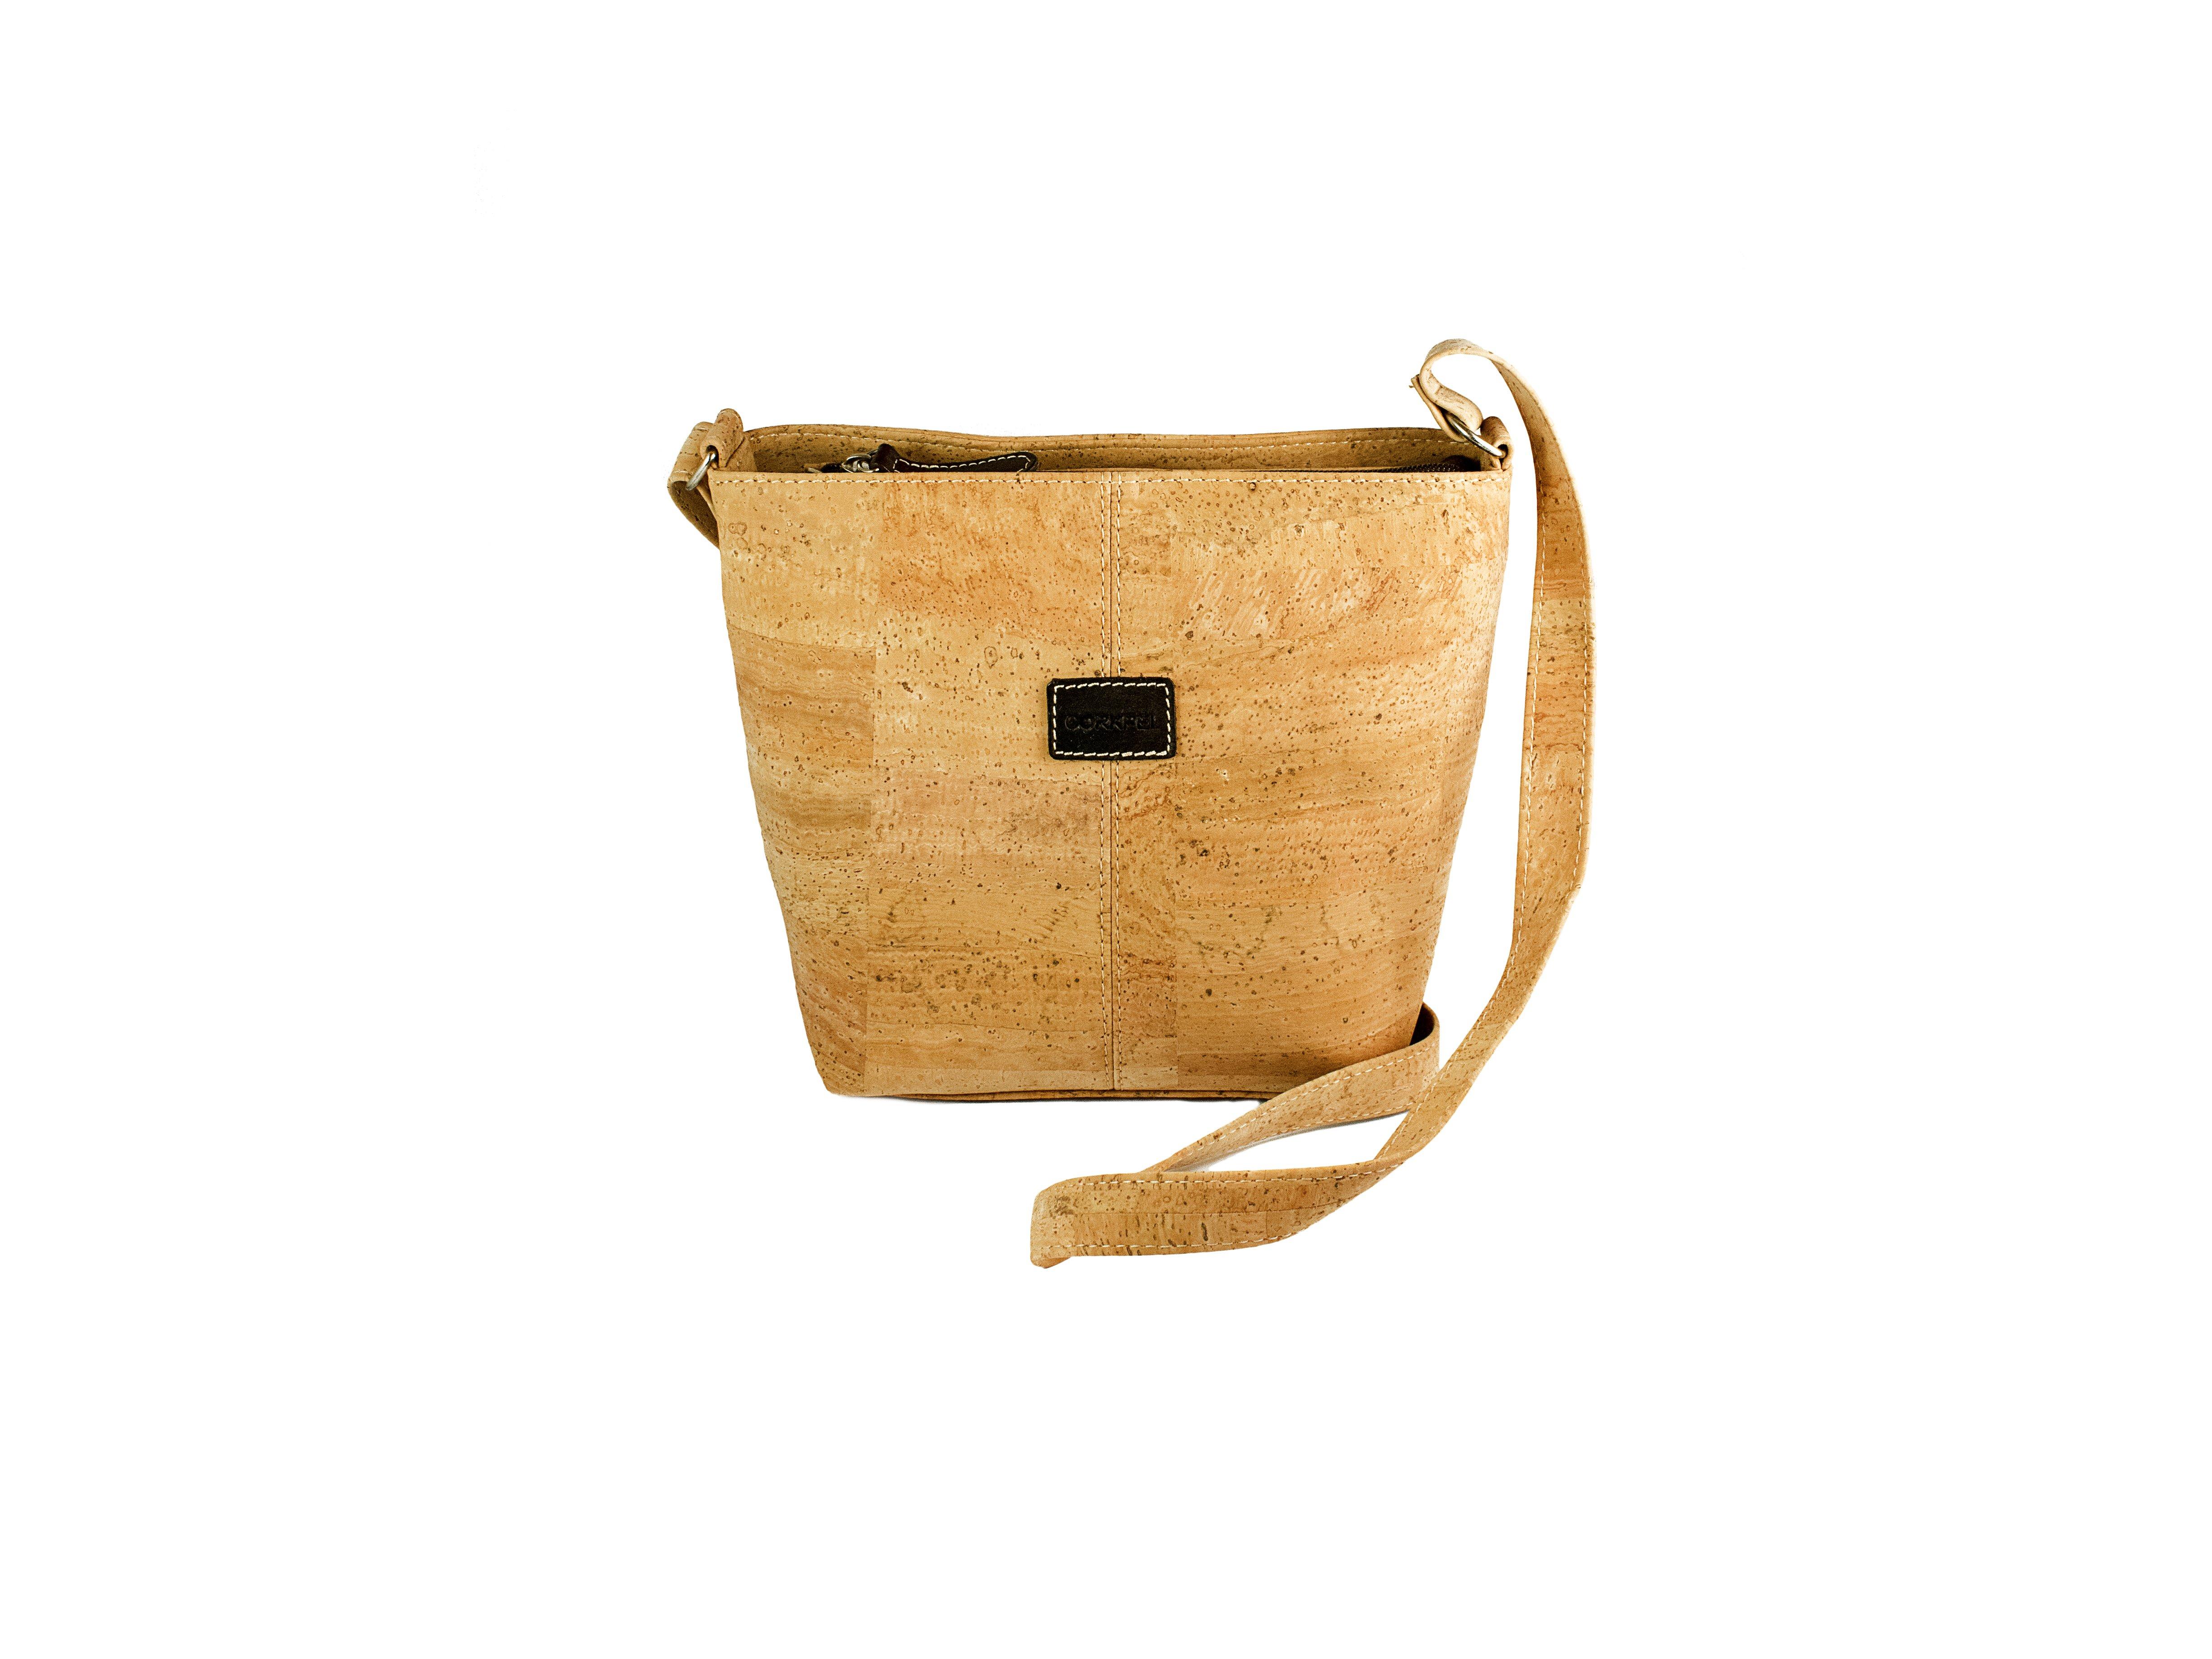 Buy cork bag 48n. Buy cork bag 48n in Spain. Buy cork bag 48n in Portugal. Buy cork bag 48n in the Canary Islands